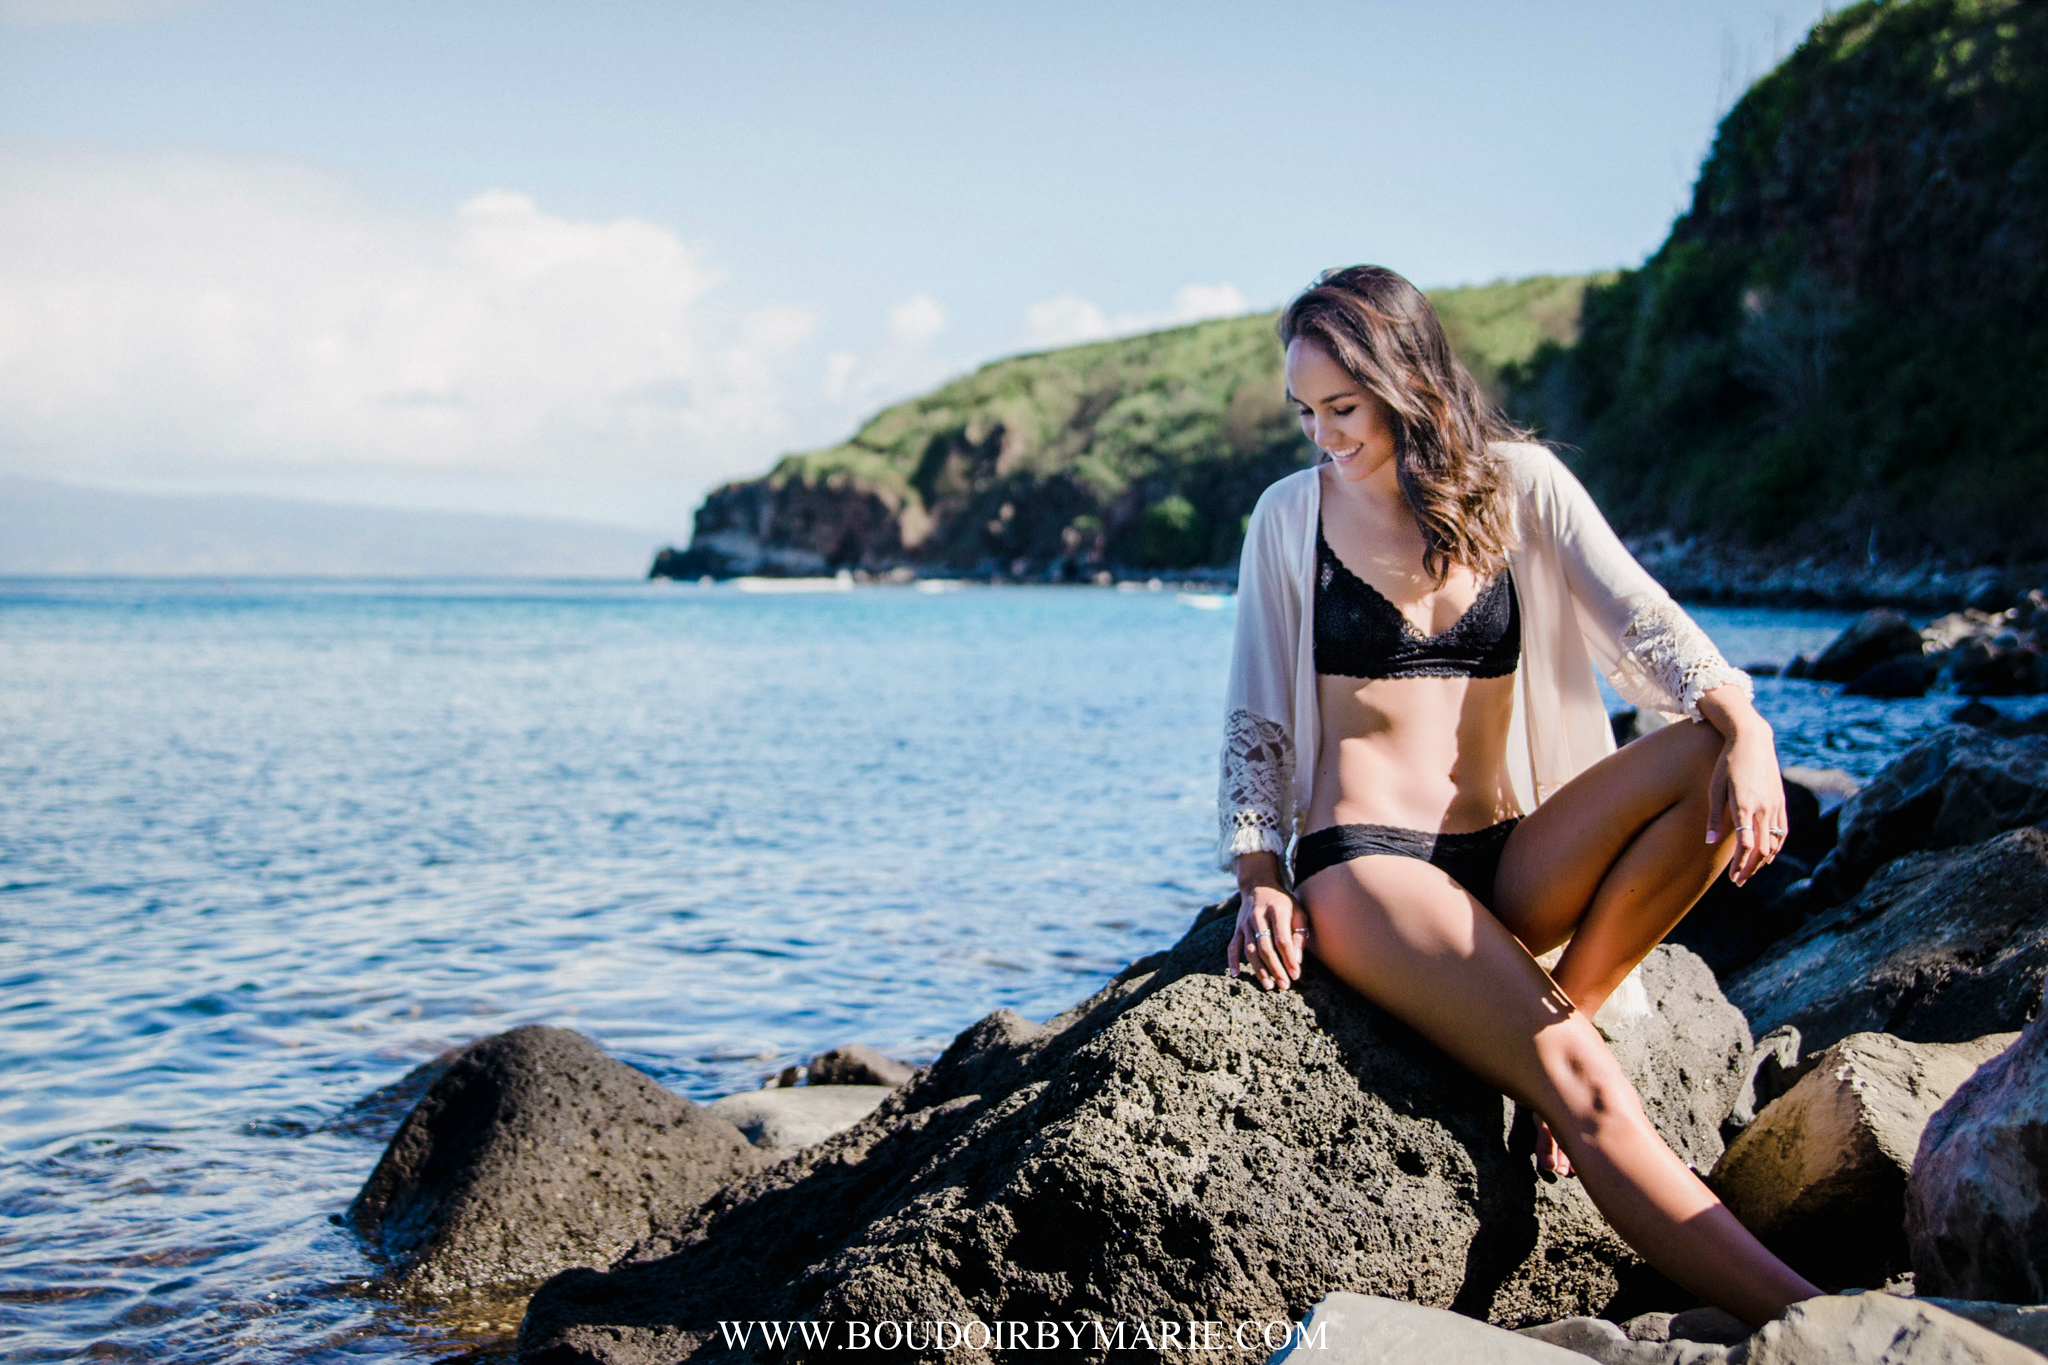 BoudoirbyMarie-MauiHawaiiBoudoir-11.jpg